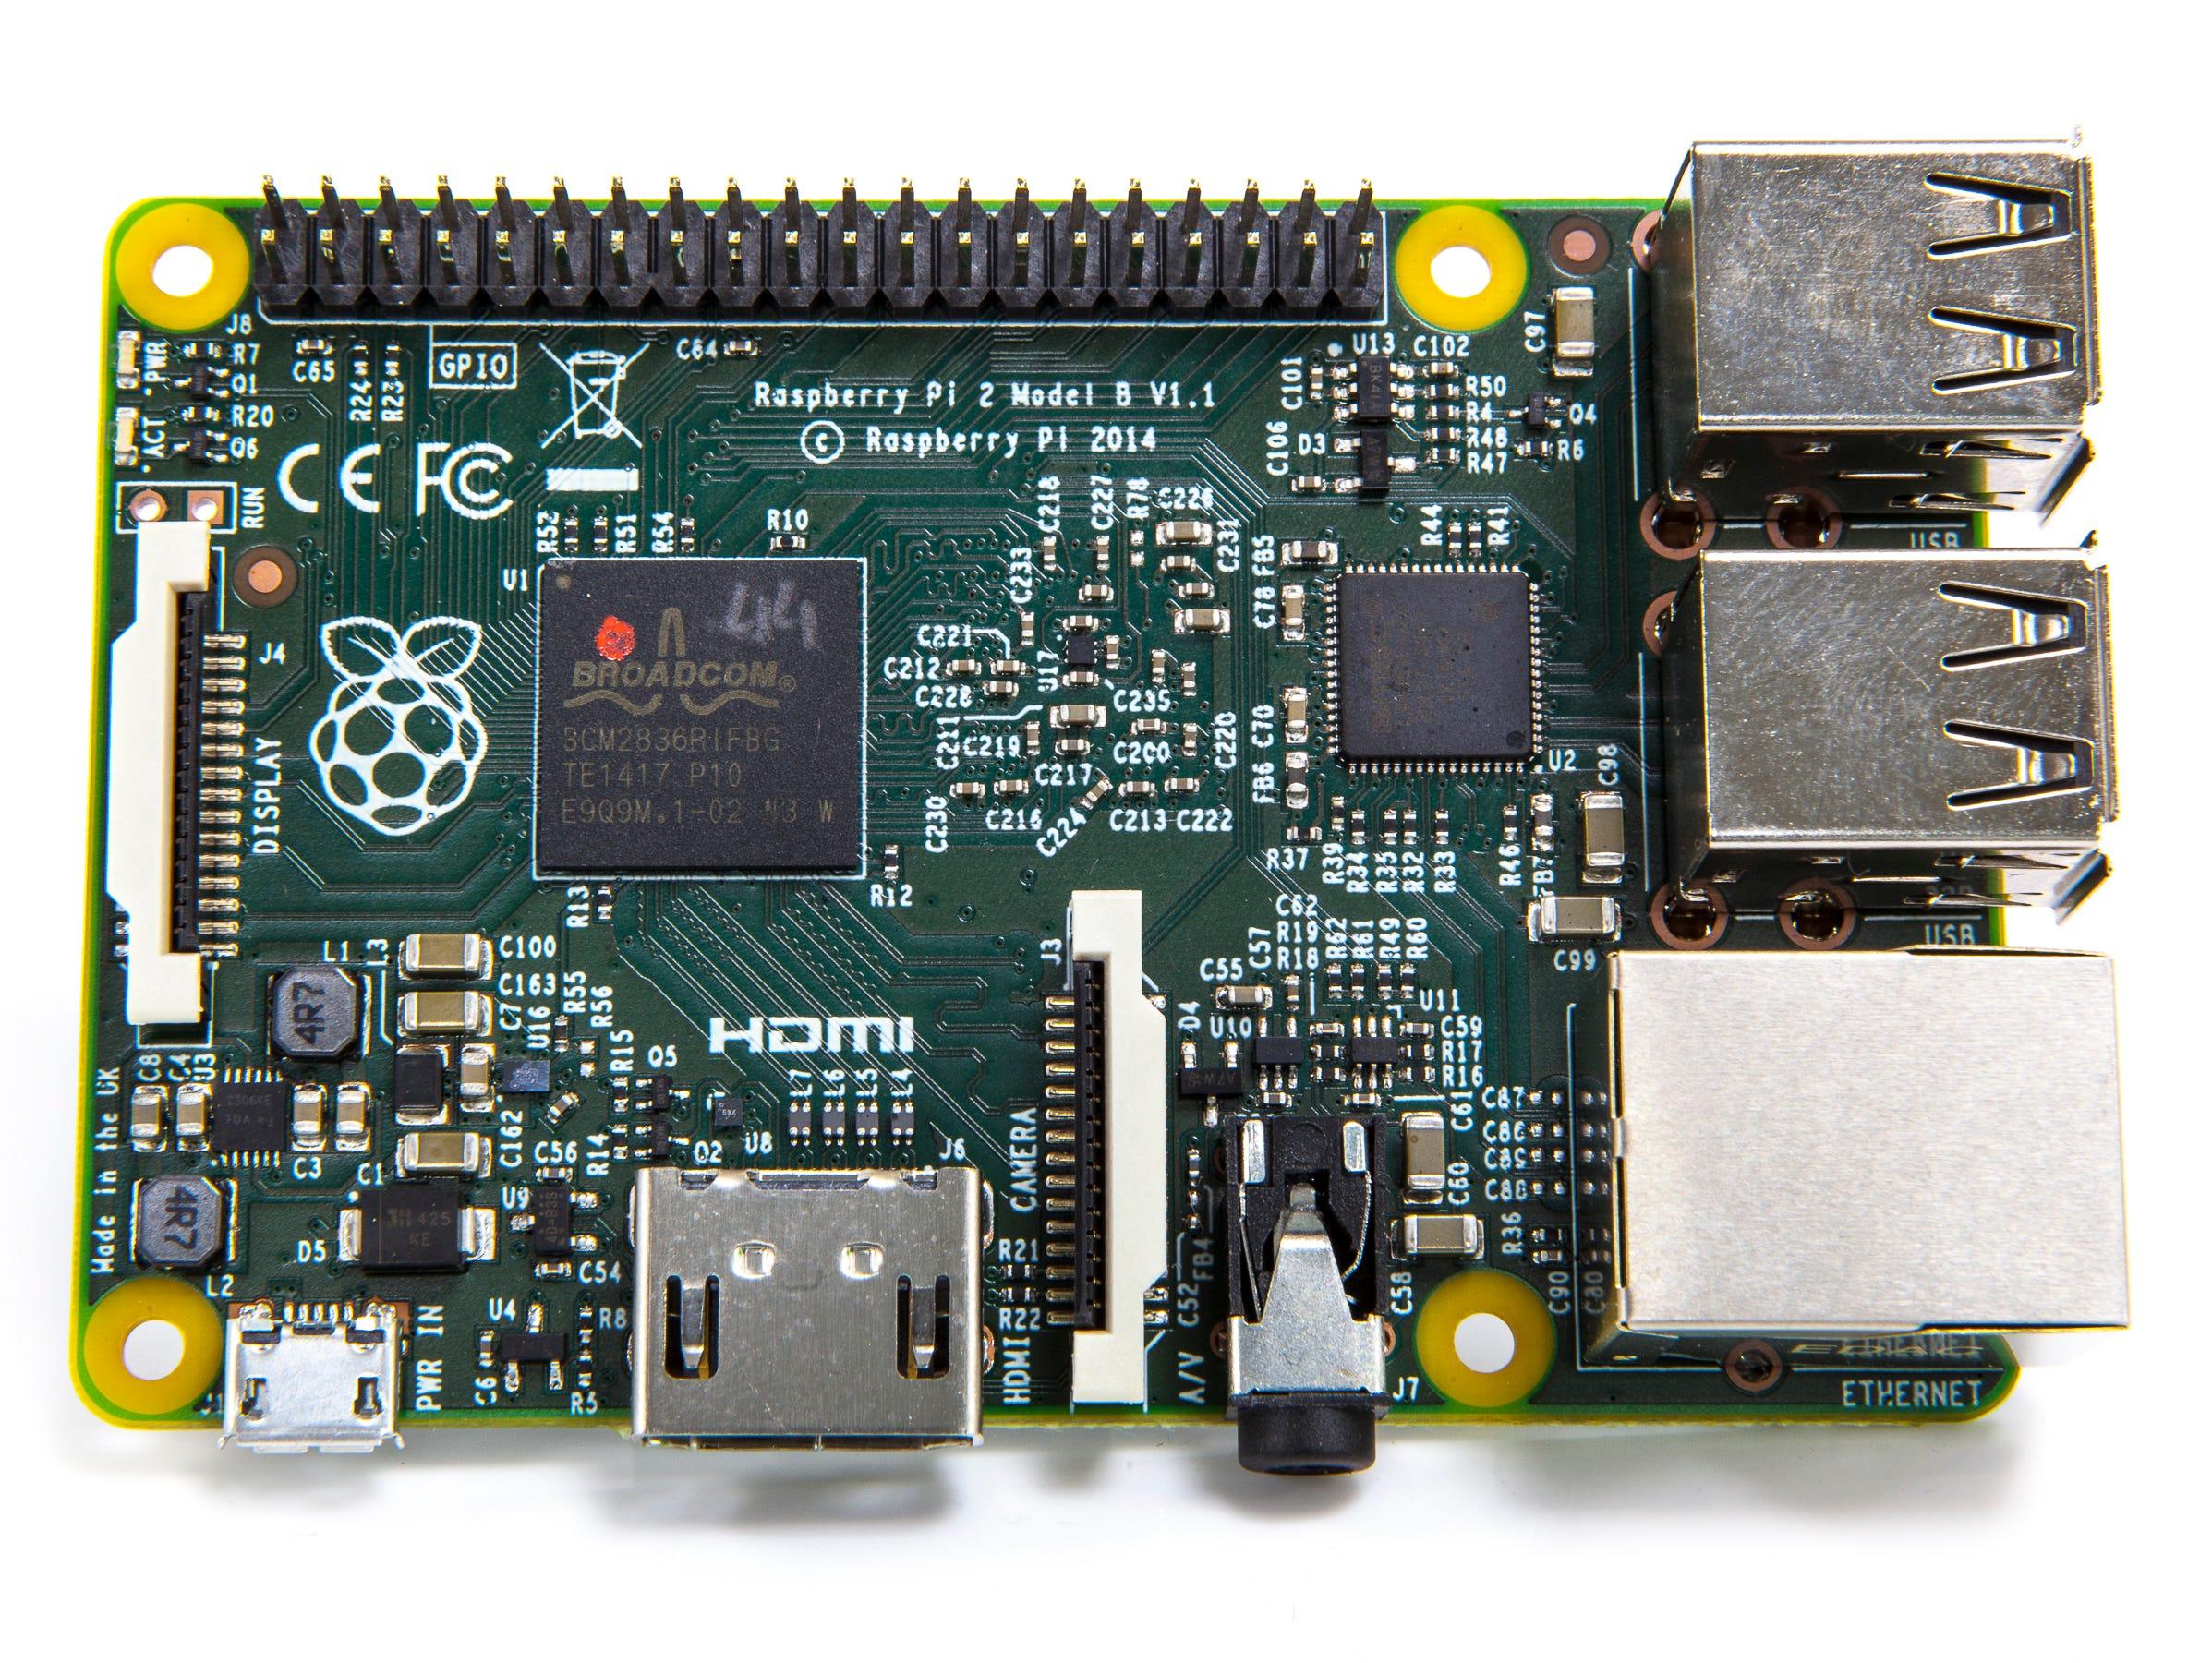 The Raspberry Pi 2 (Model B).